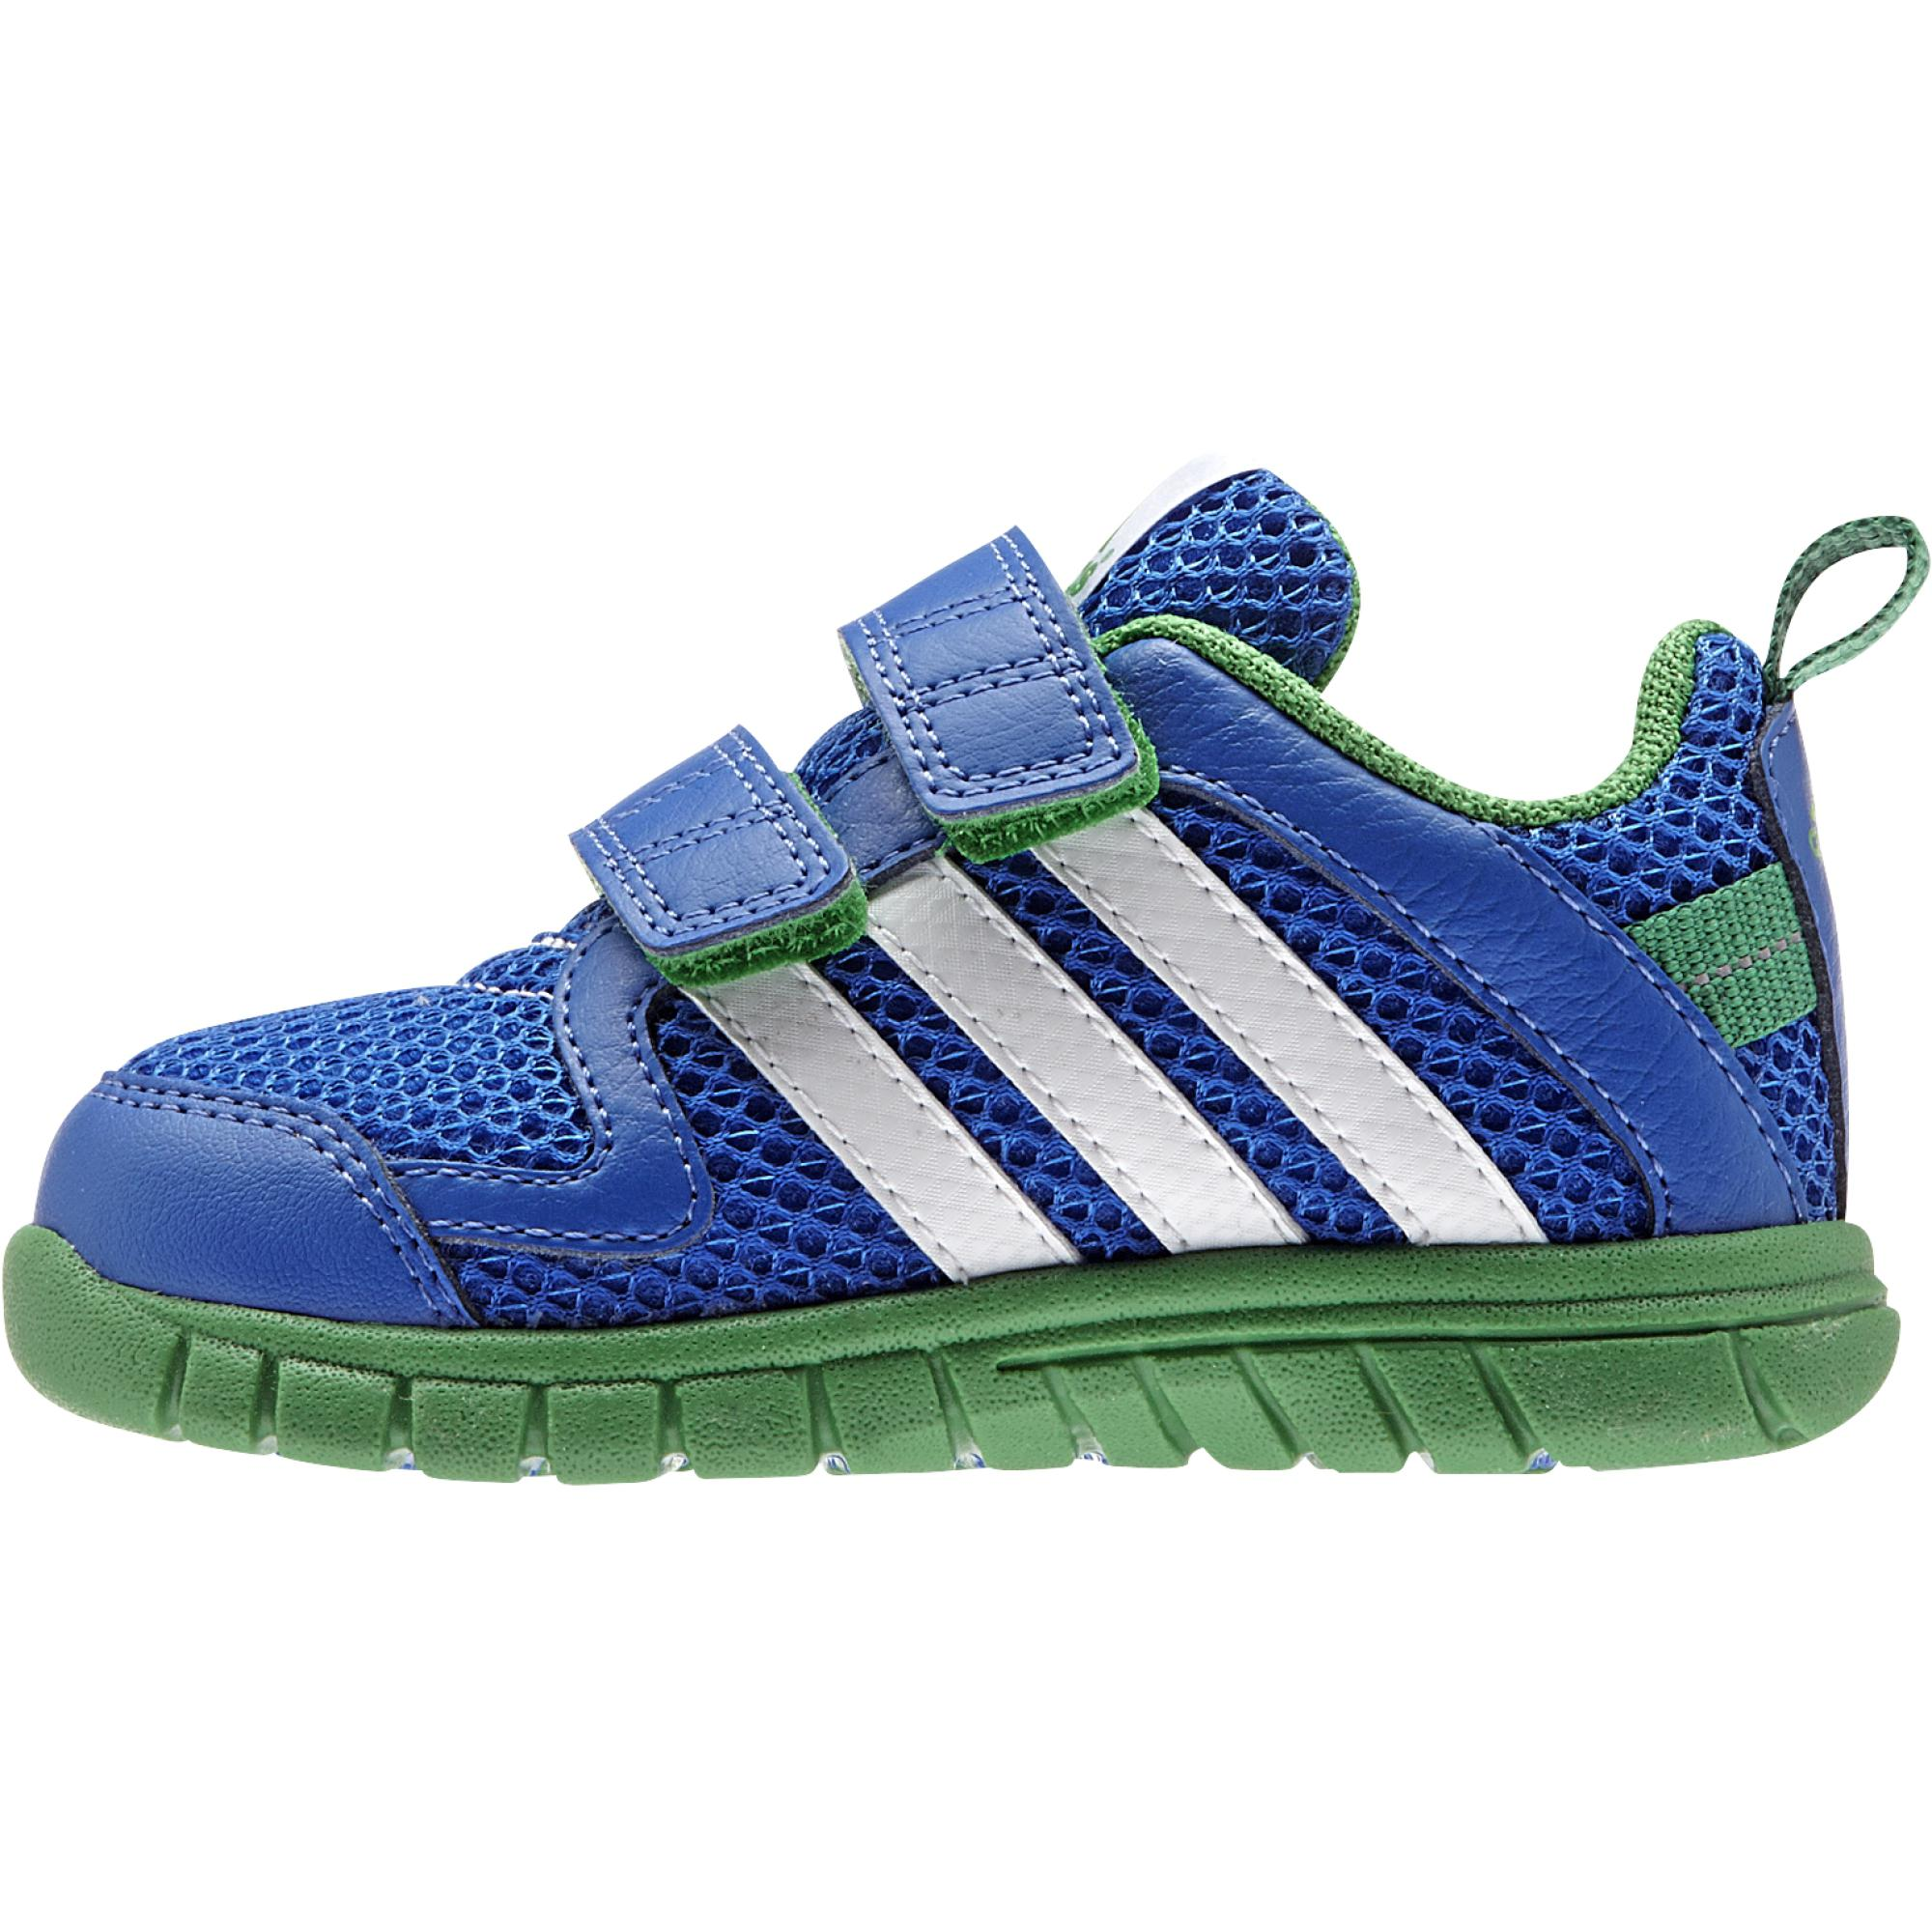 info for b0df4 7163f Adidas STA Fluid 3 CF I (azul verde blanco)